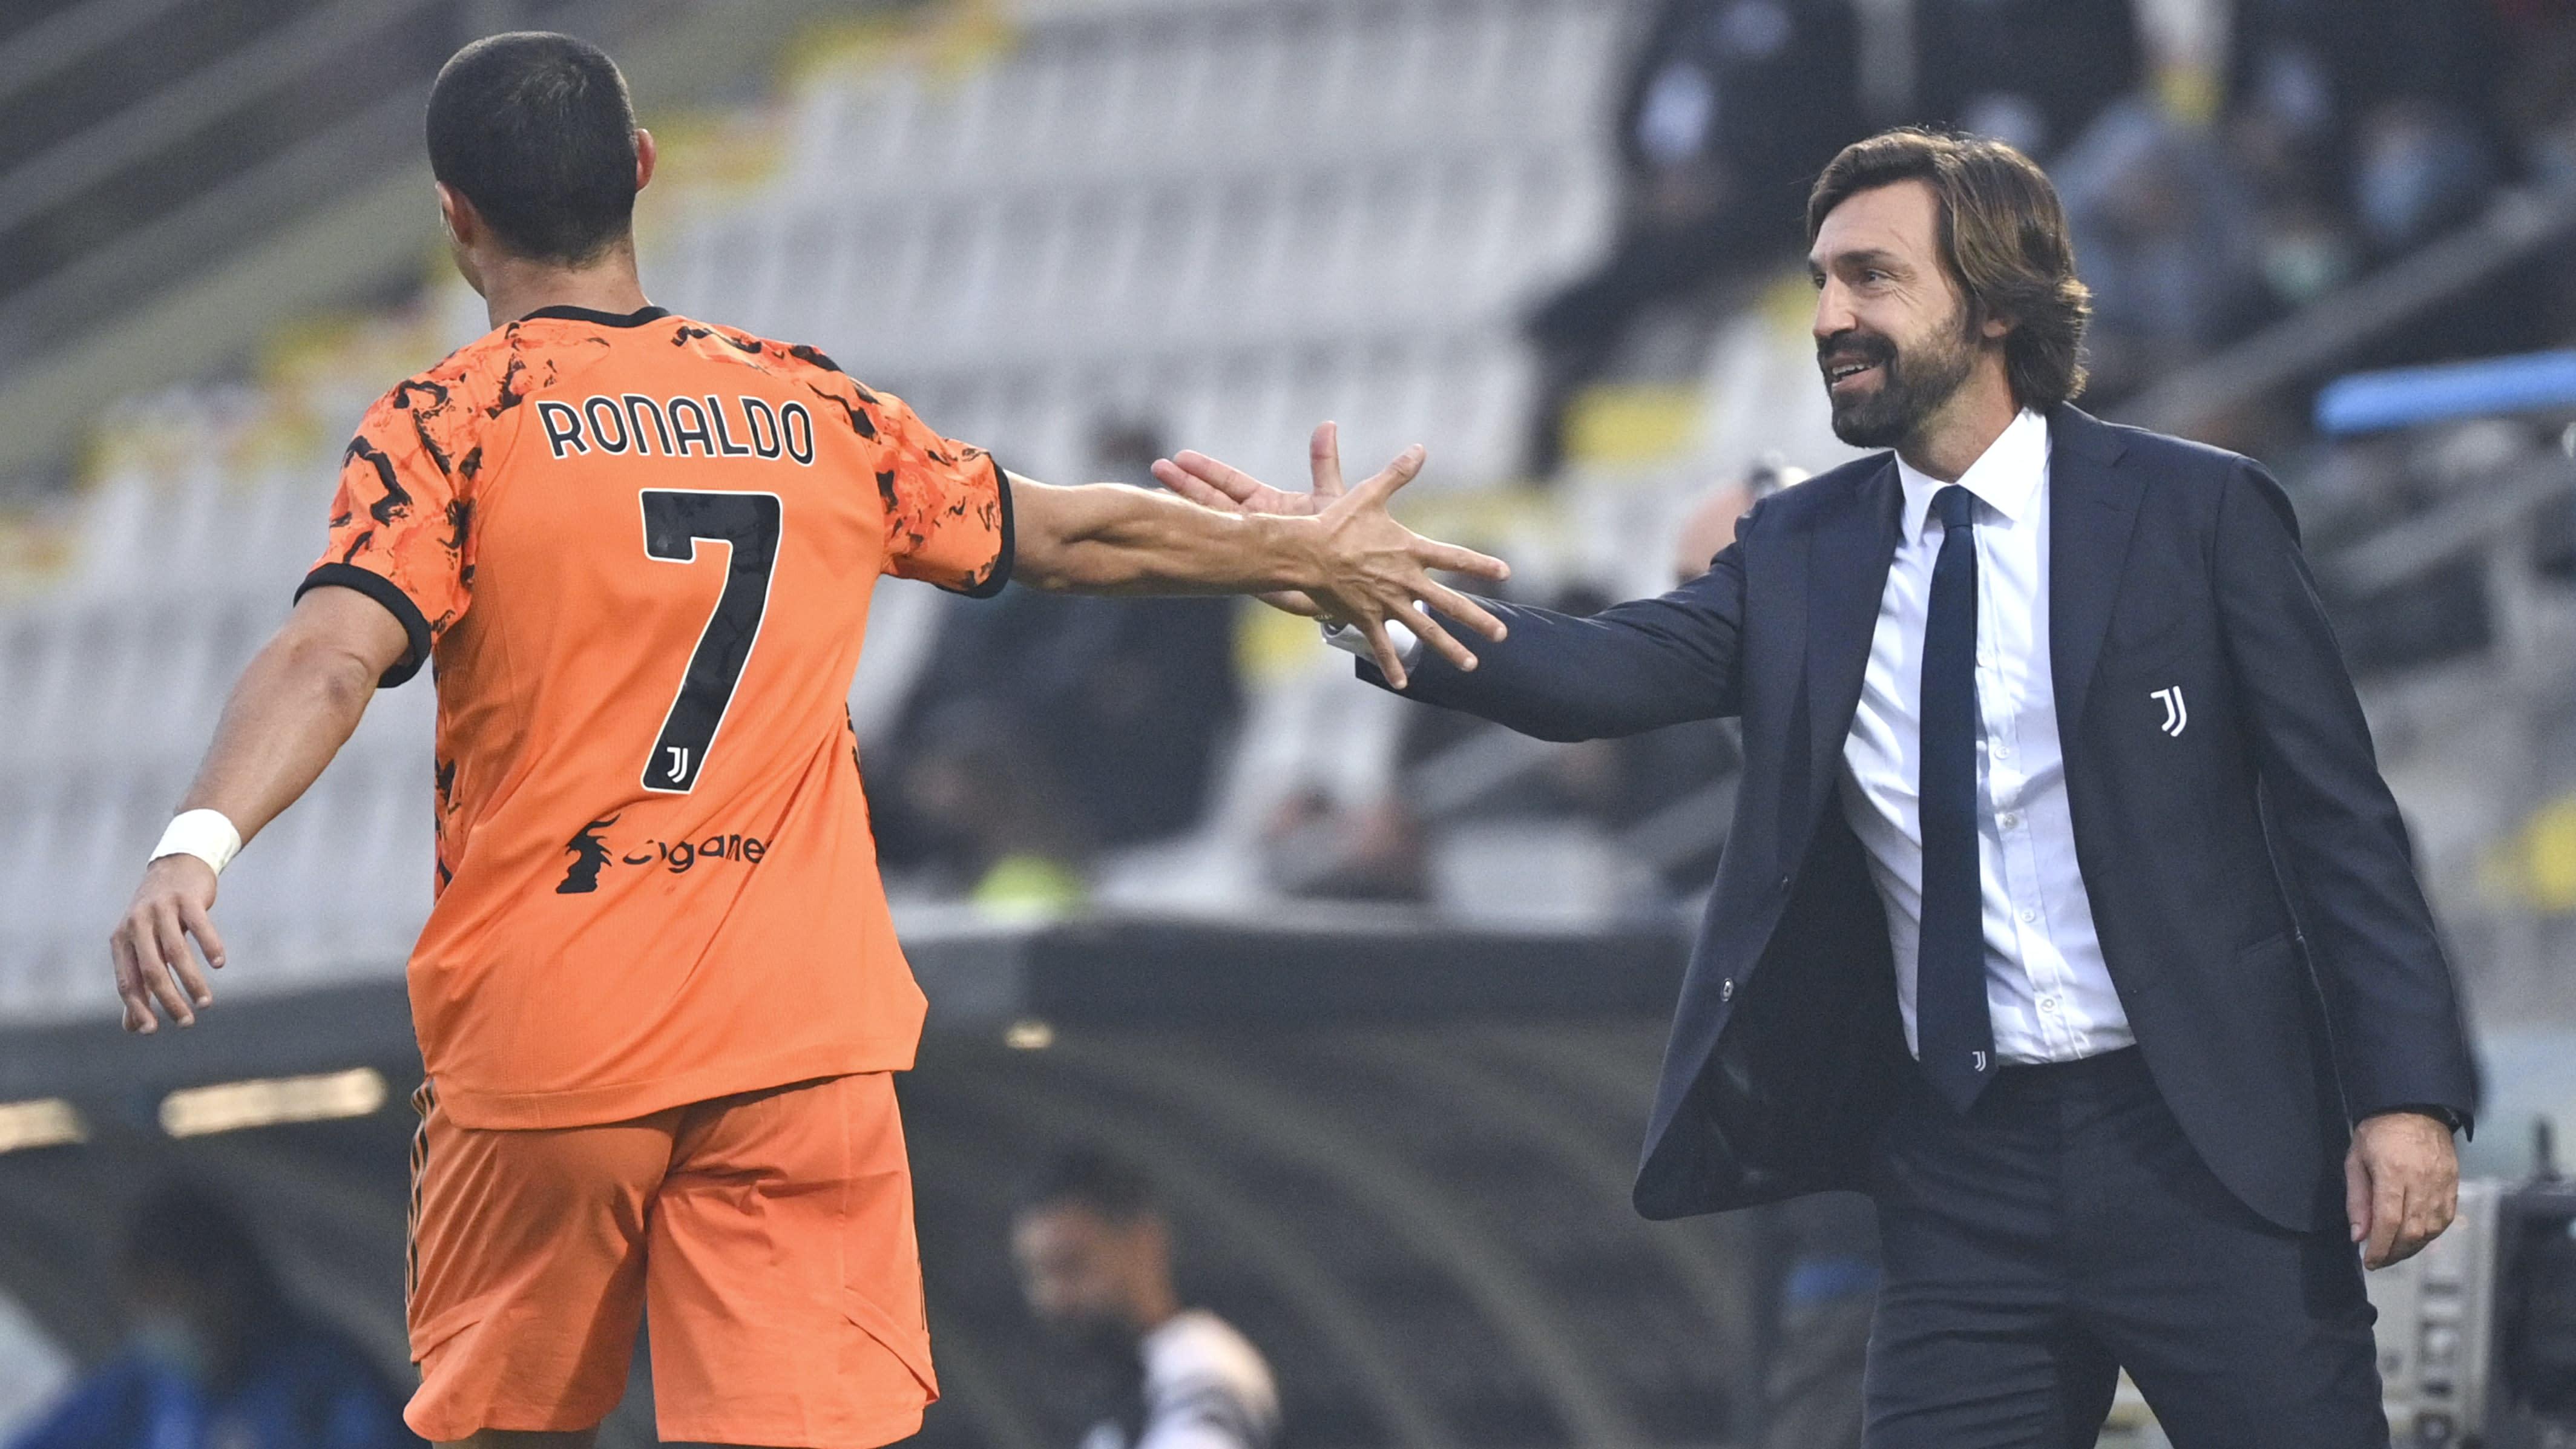 Cristiano Ronaldo marks his return with a brace as Juventus beat Spezia